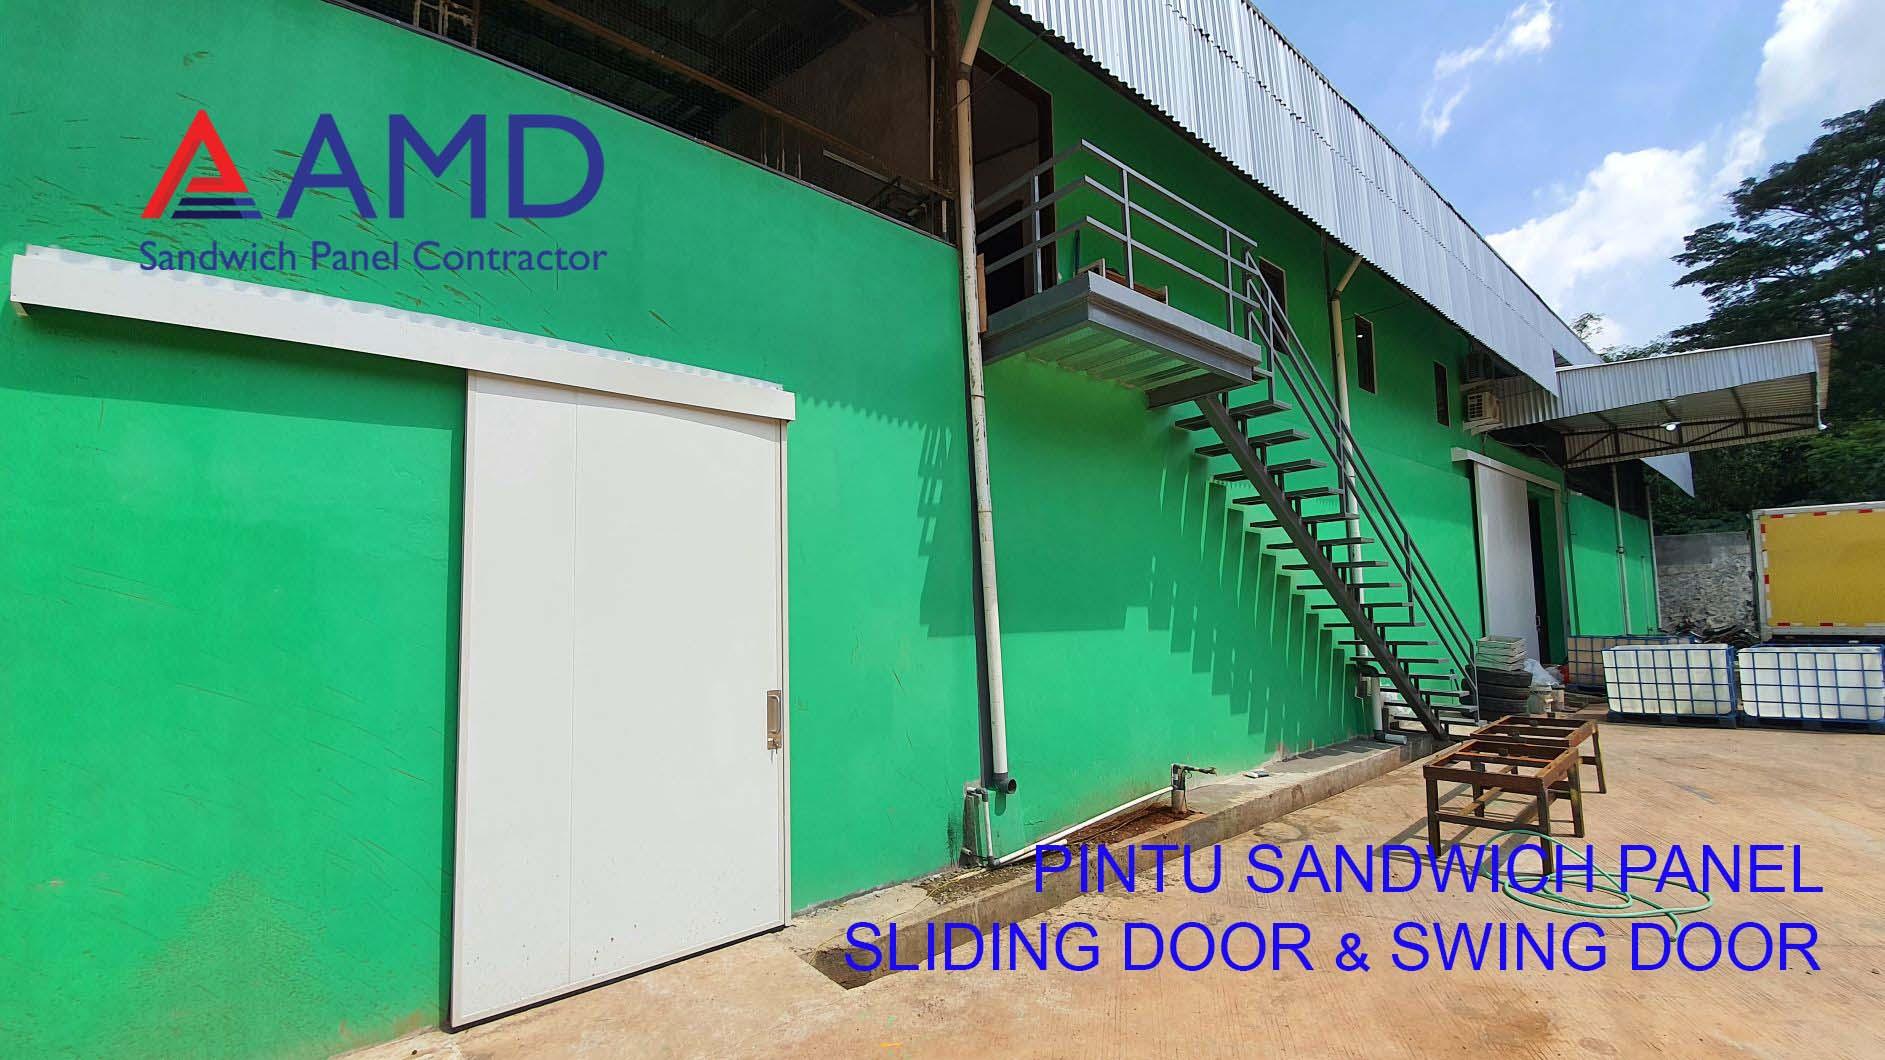 Pintu Sandwich Panel